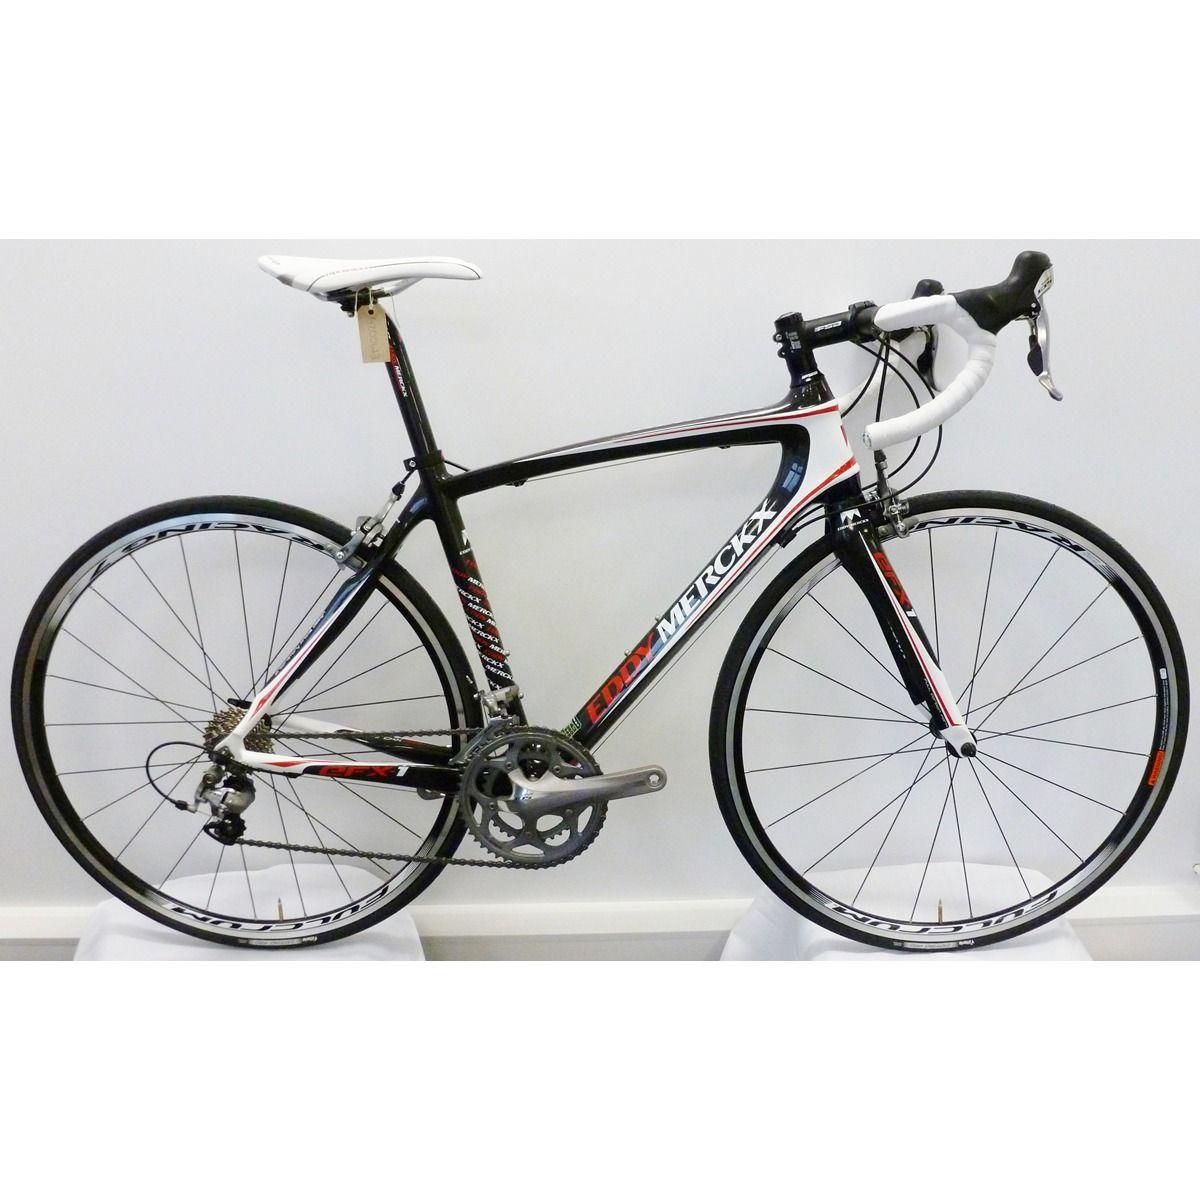 Eddy Merckx EFX-1 Shimano 105 5700 | Eddy Merckx Road Bikes | Merlin Cycles